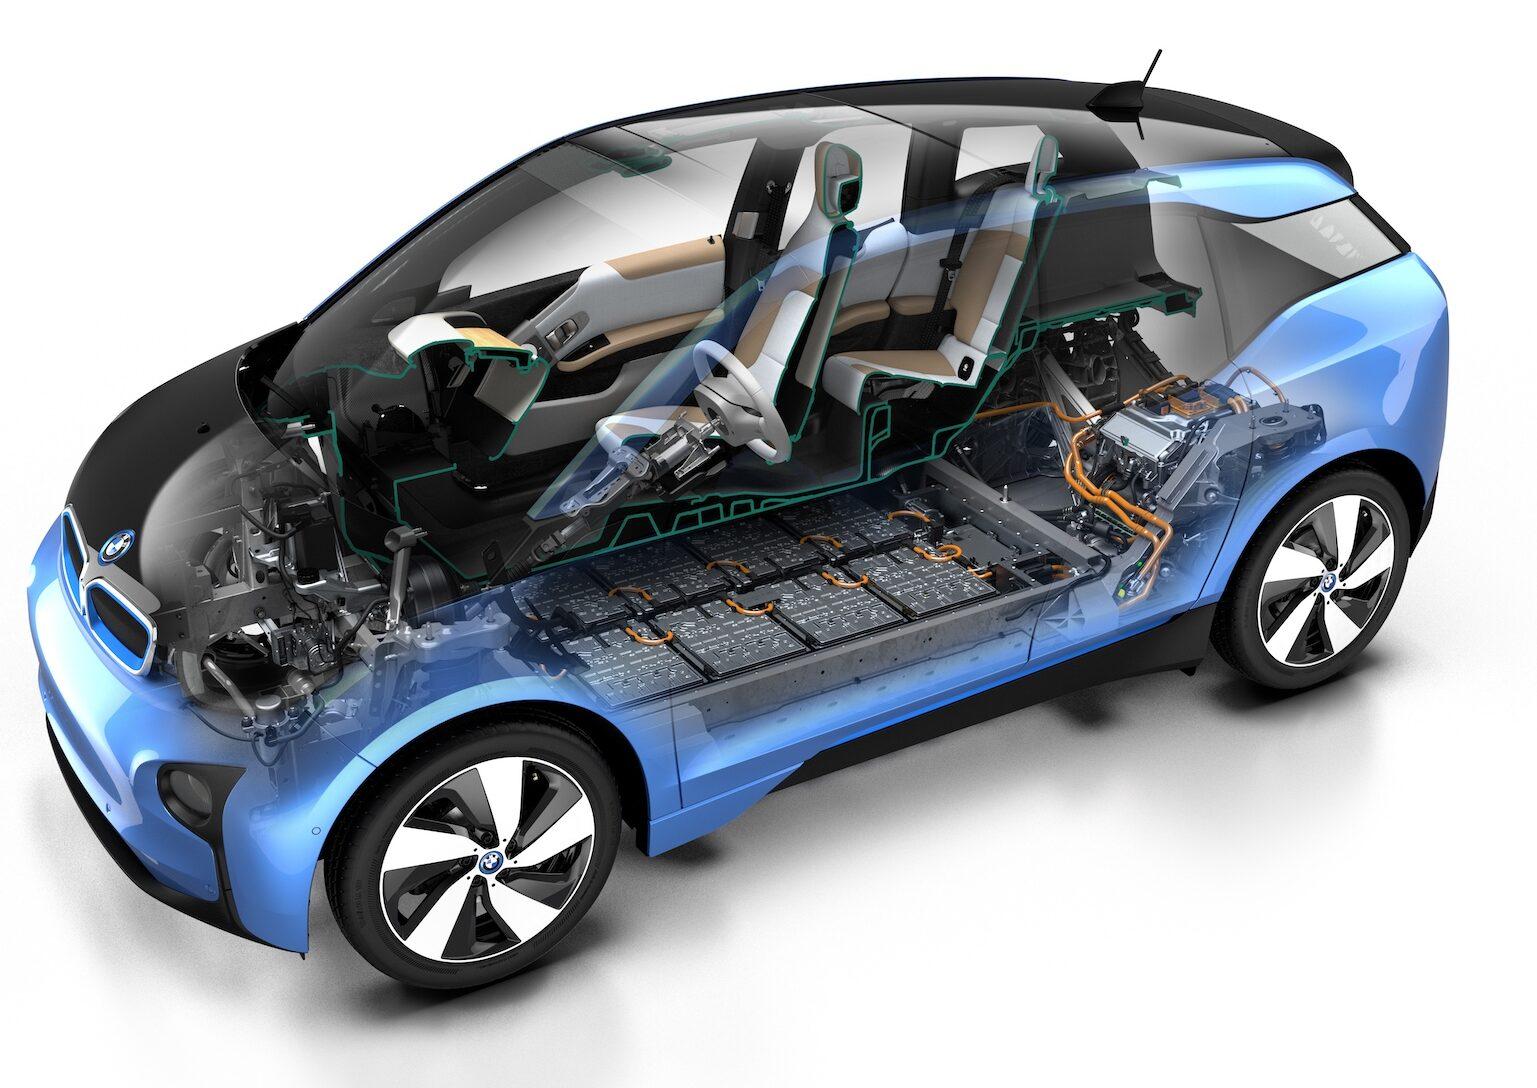 BMW i3 buying guide cutaway - EVs Unplugged